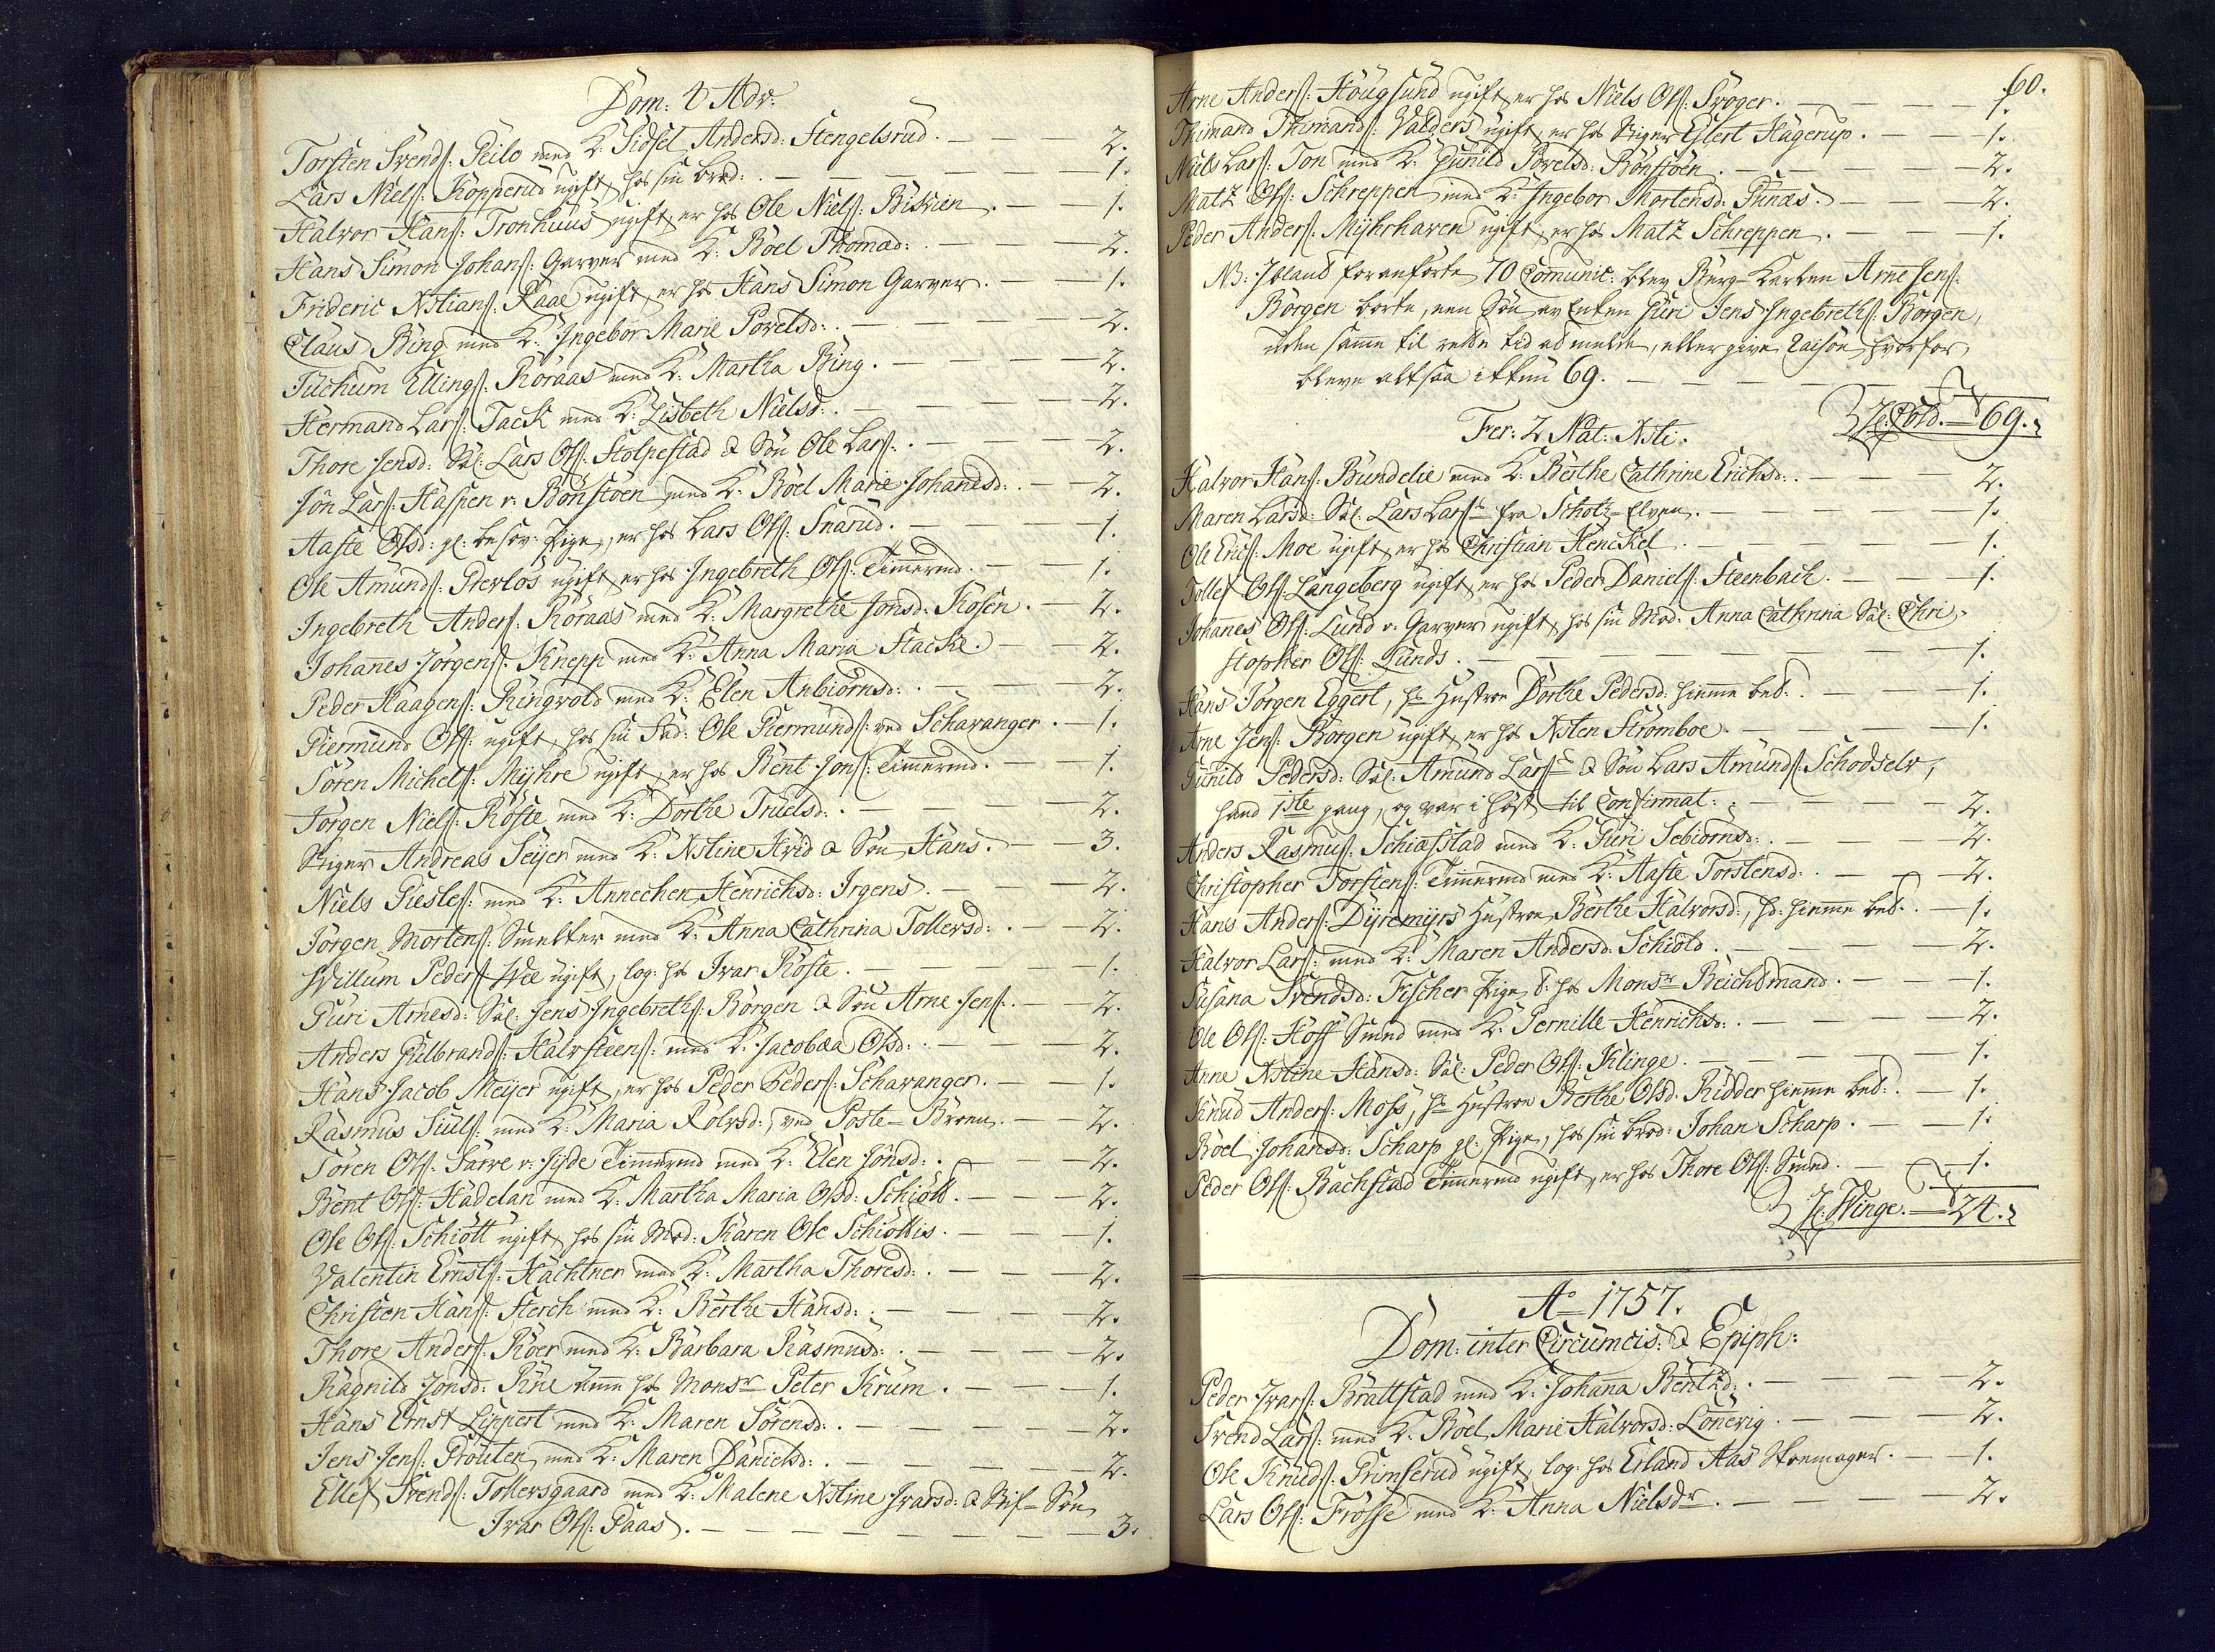 SAKO, Kongsberg kirkebøker, M/Ma/L0005: Kommunikantprotokoll nr. 5, 1755-1761, s. 60